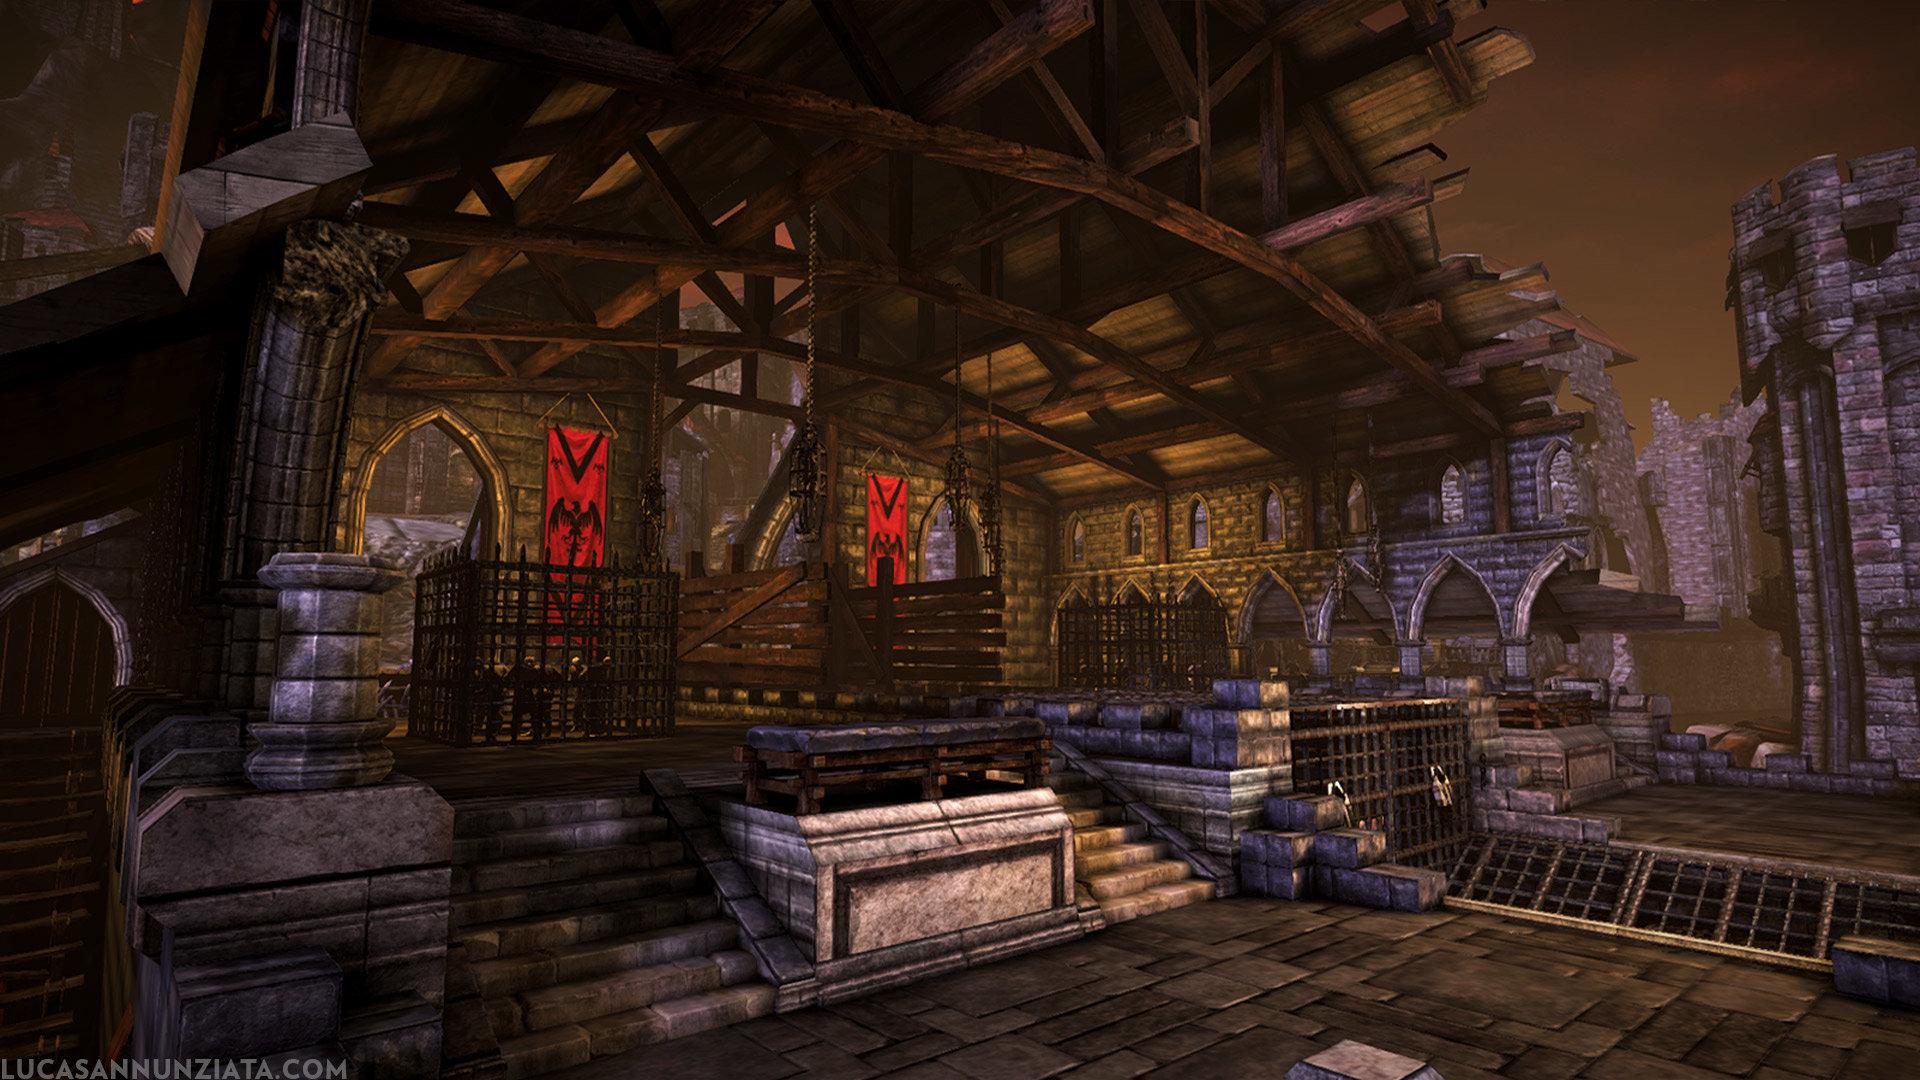 Lucas annunziata citadel 03